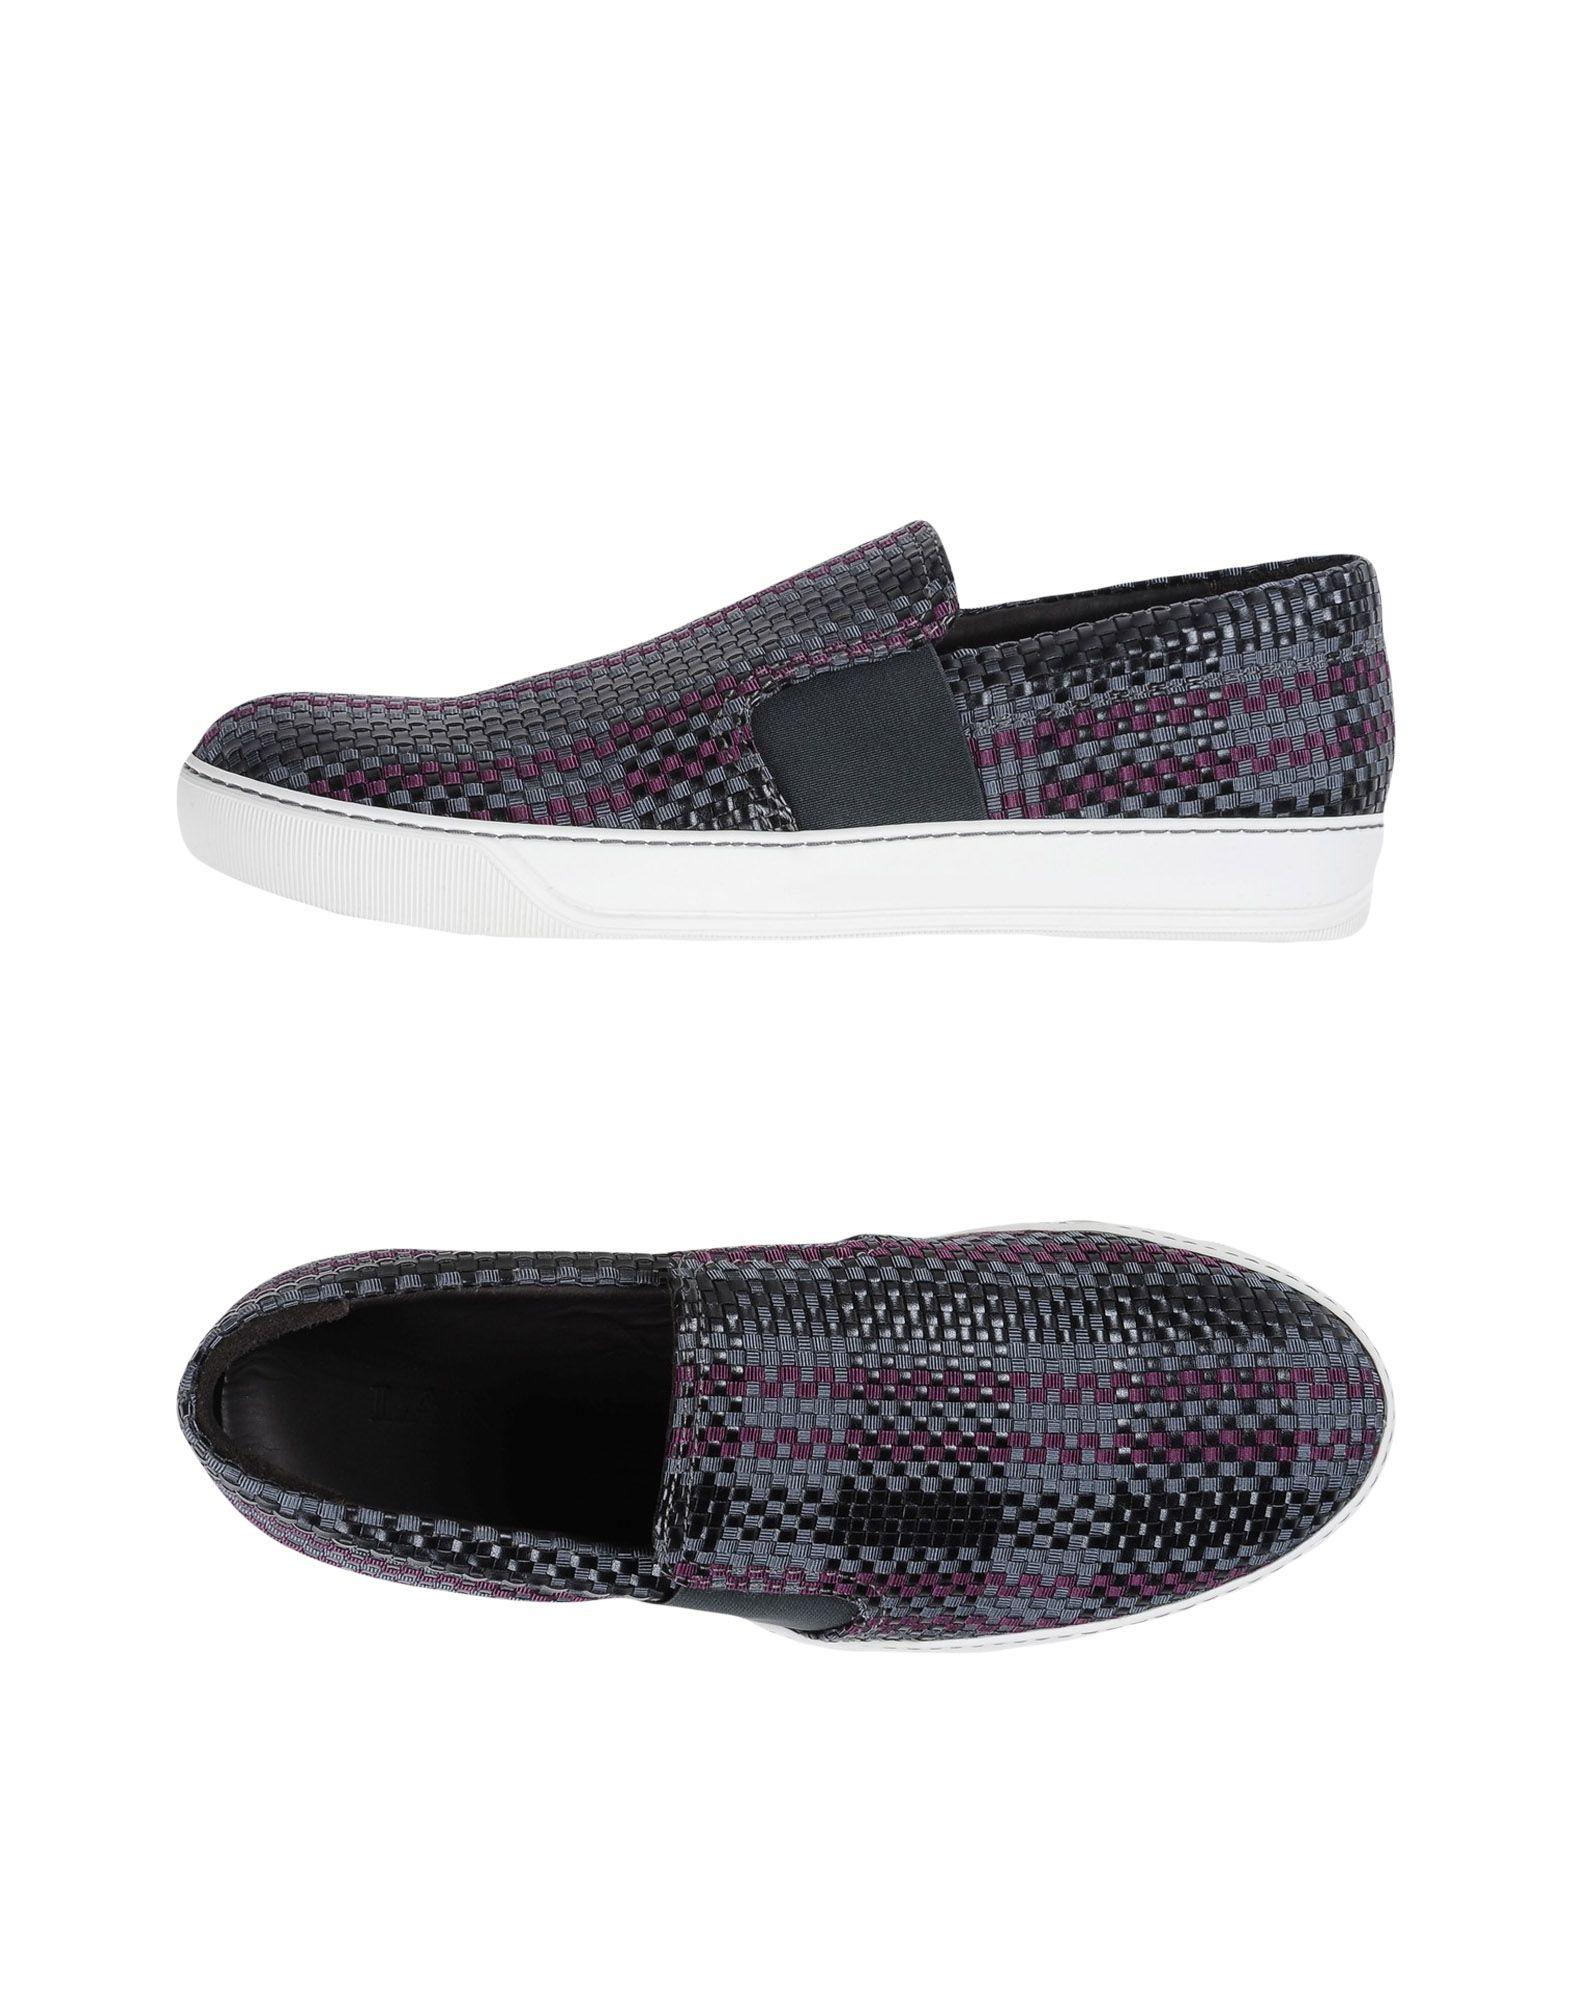 Lanvin Sneakers Herren  11216541WO Gute Qualität beliebte Schuhe